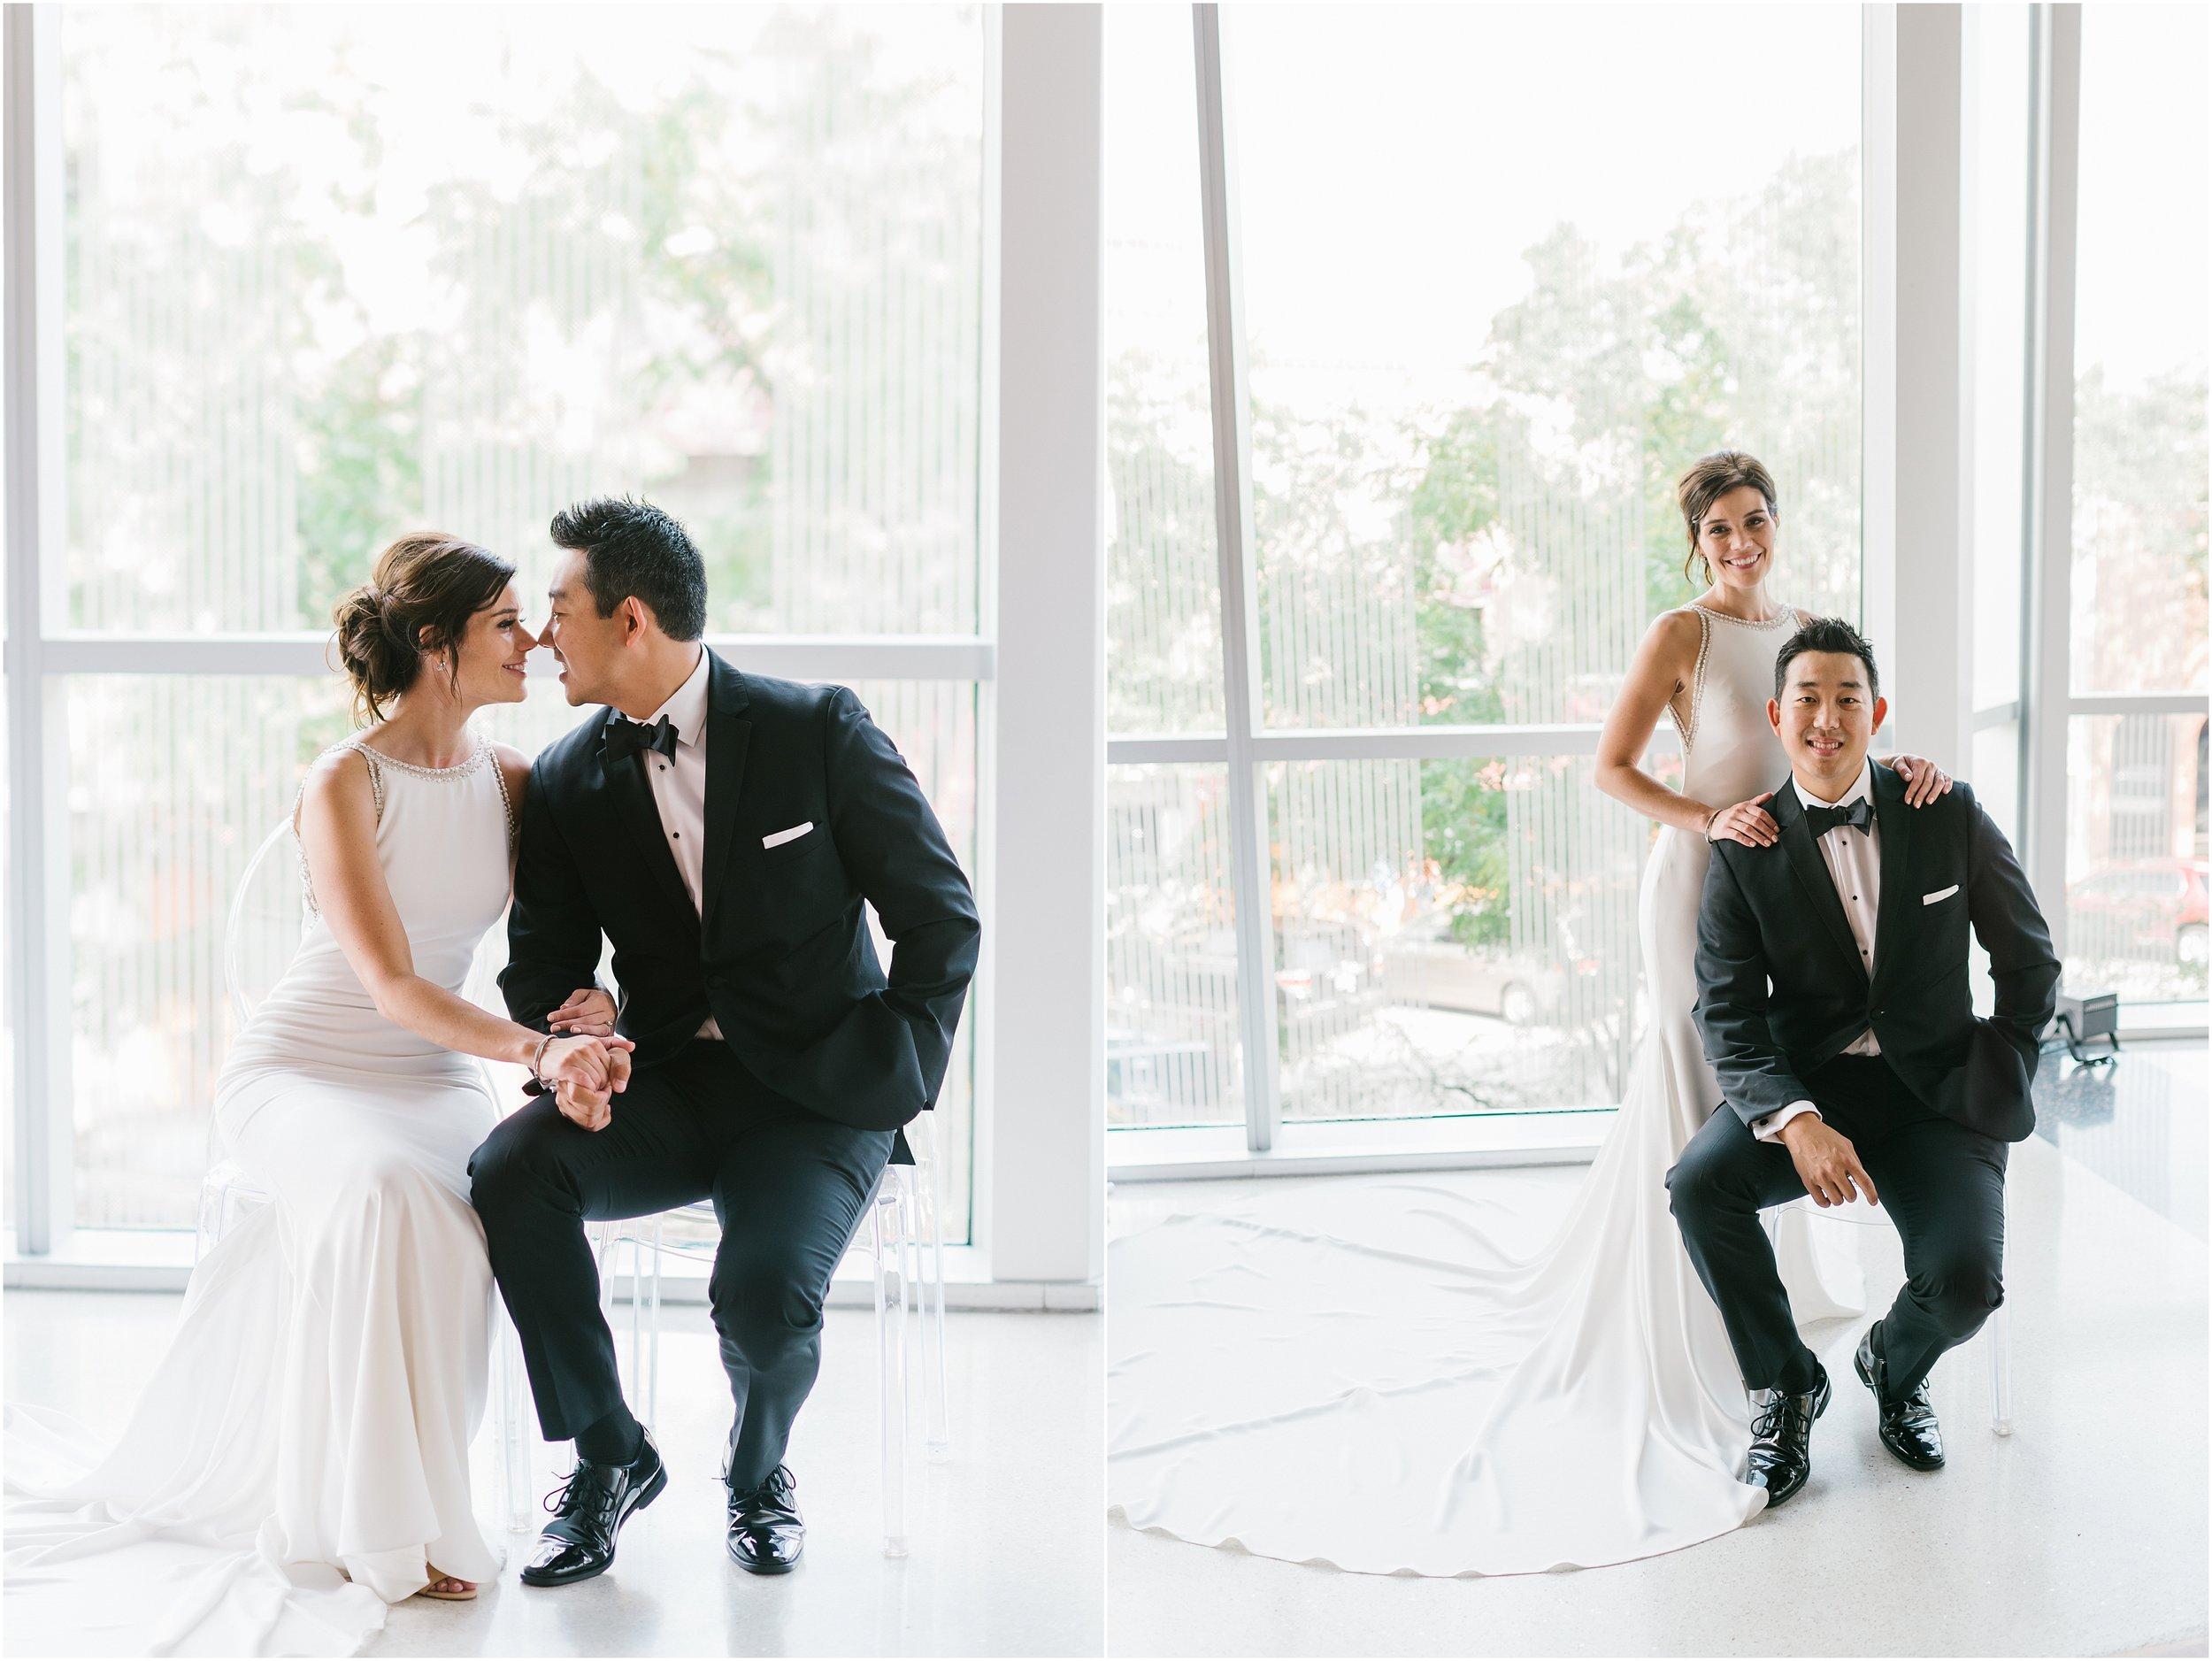 Rebecca_Shehorn_Photography_Indianapolis Wedding Photographer Sycamore at Mallow Run Wedding_9753.jpg